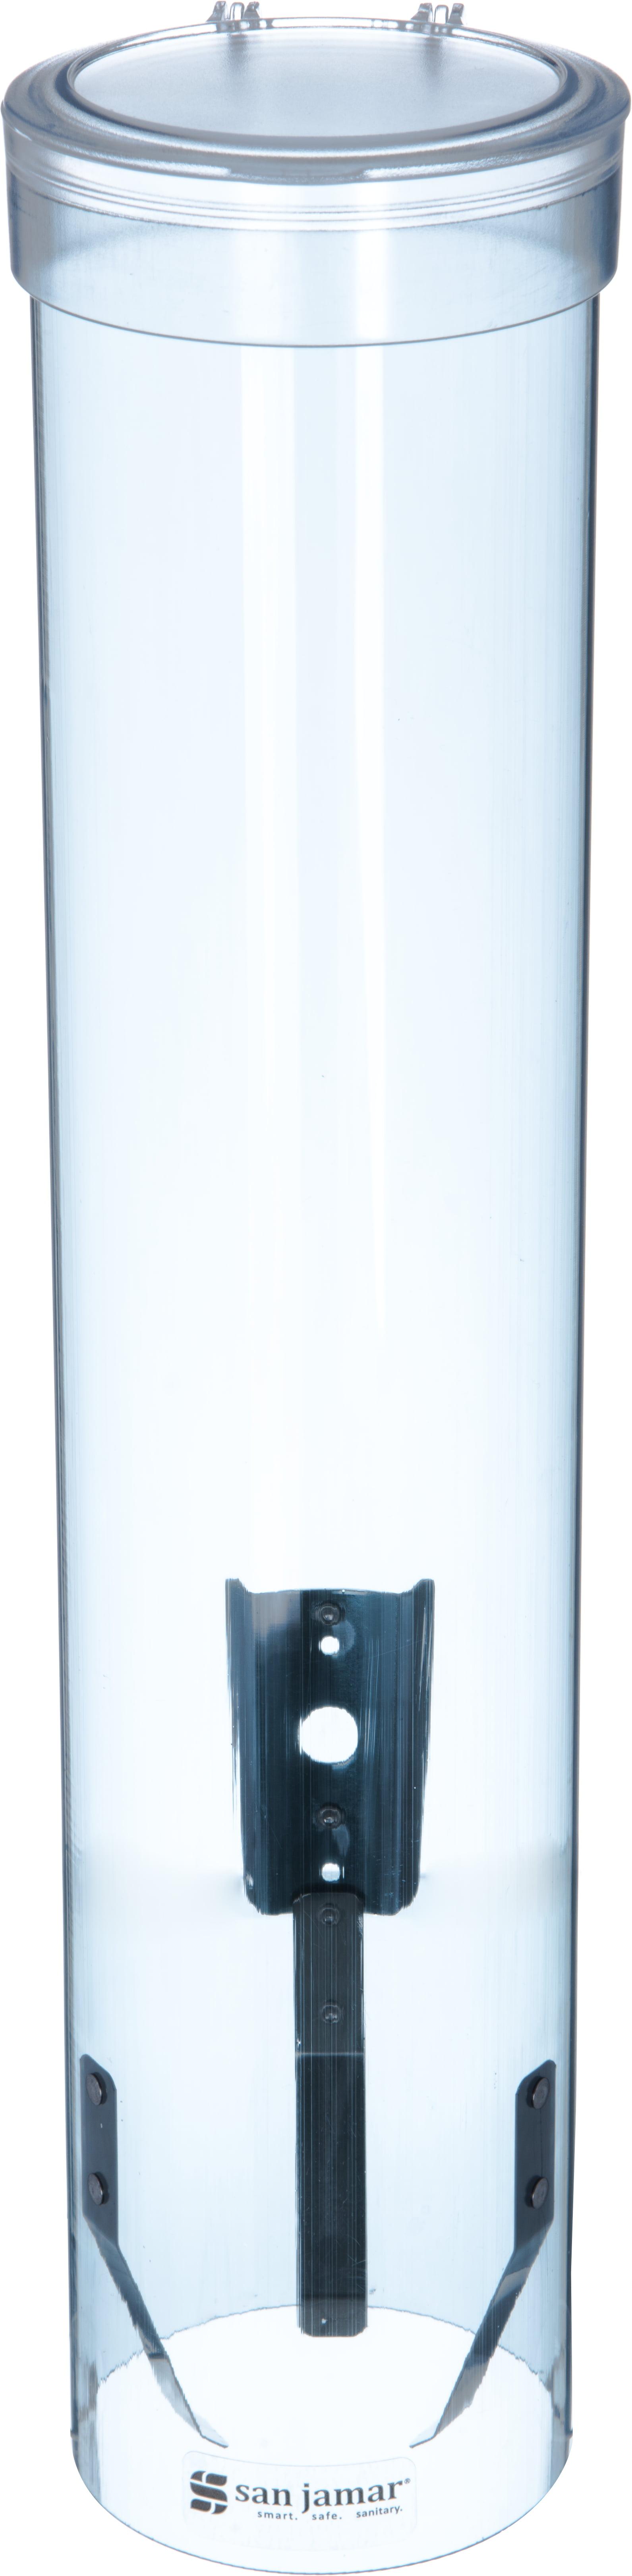 San Jamar C4210PFSD Foam Cup Dispenser w//Removable Cap Sand Pull-Type